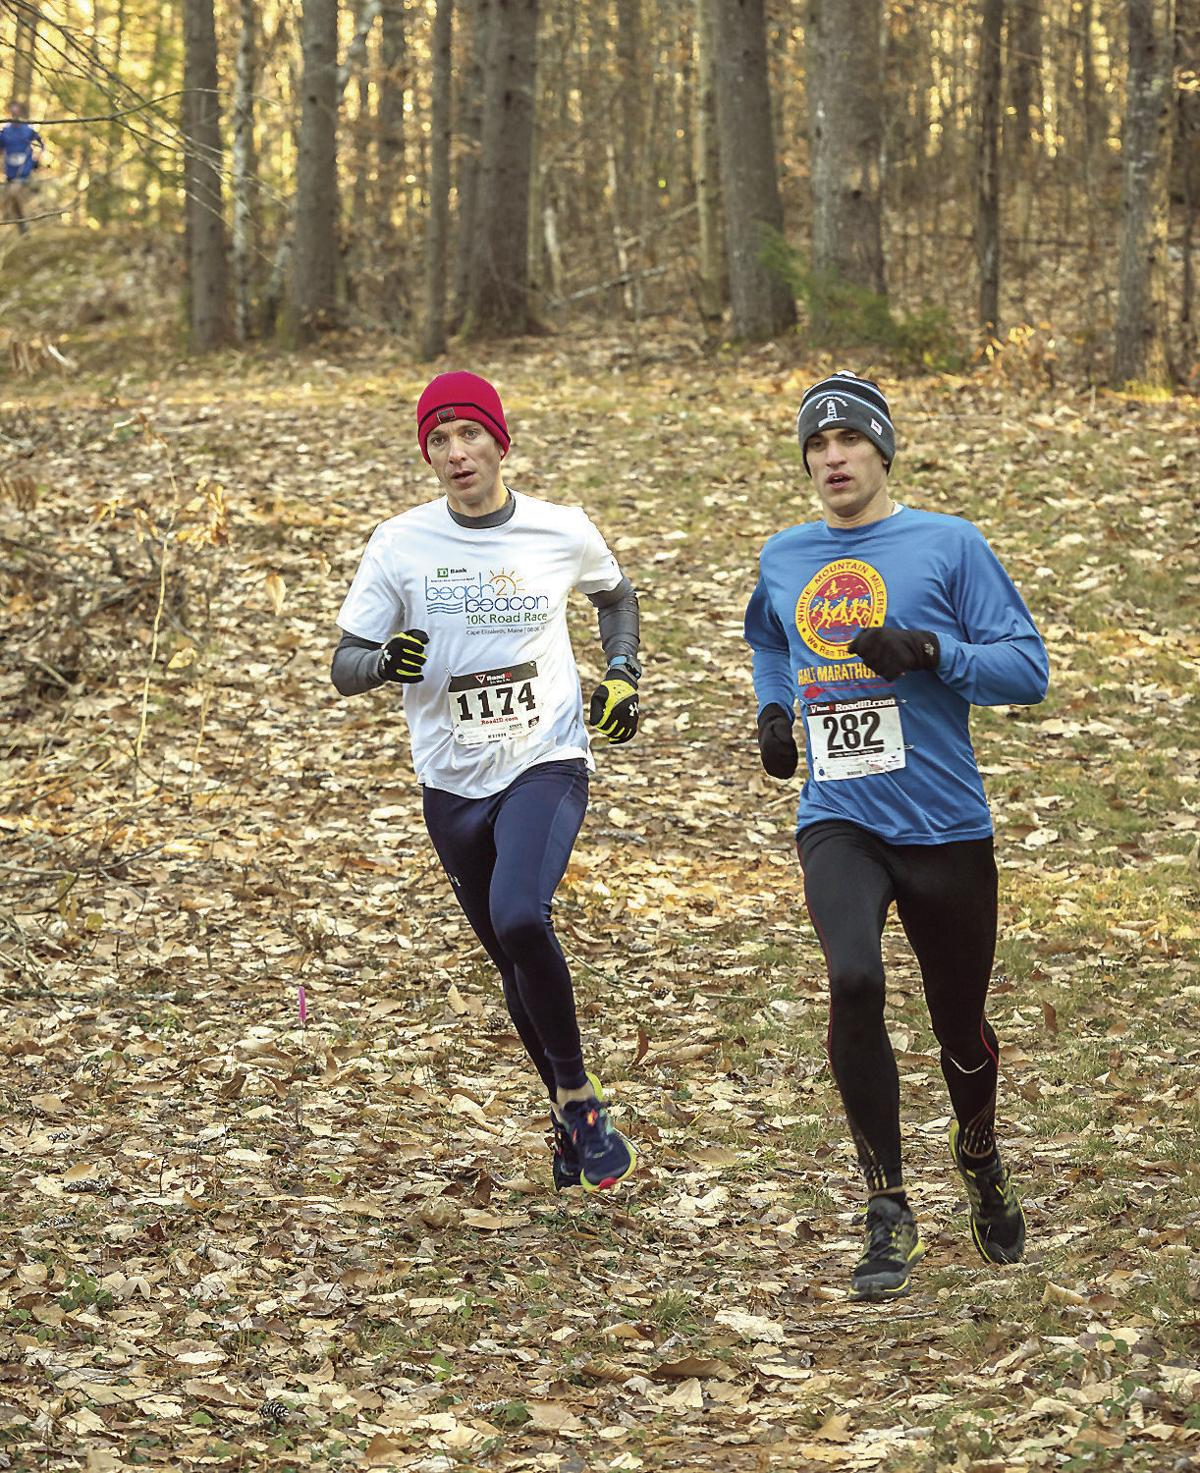 On the Run - Nov. 2